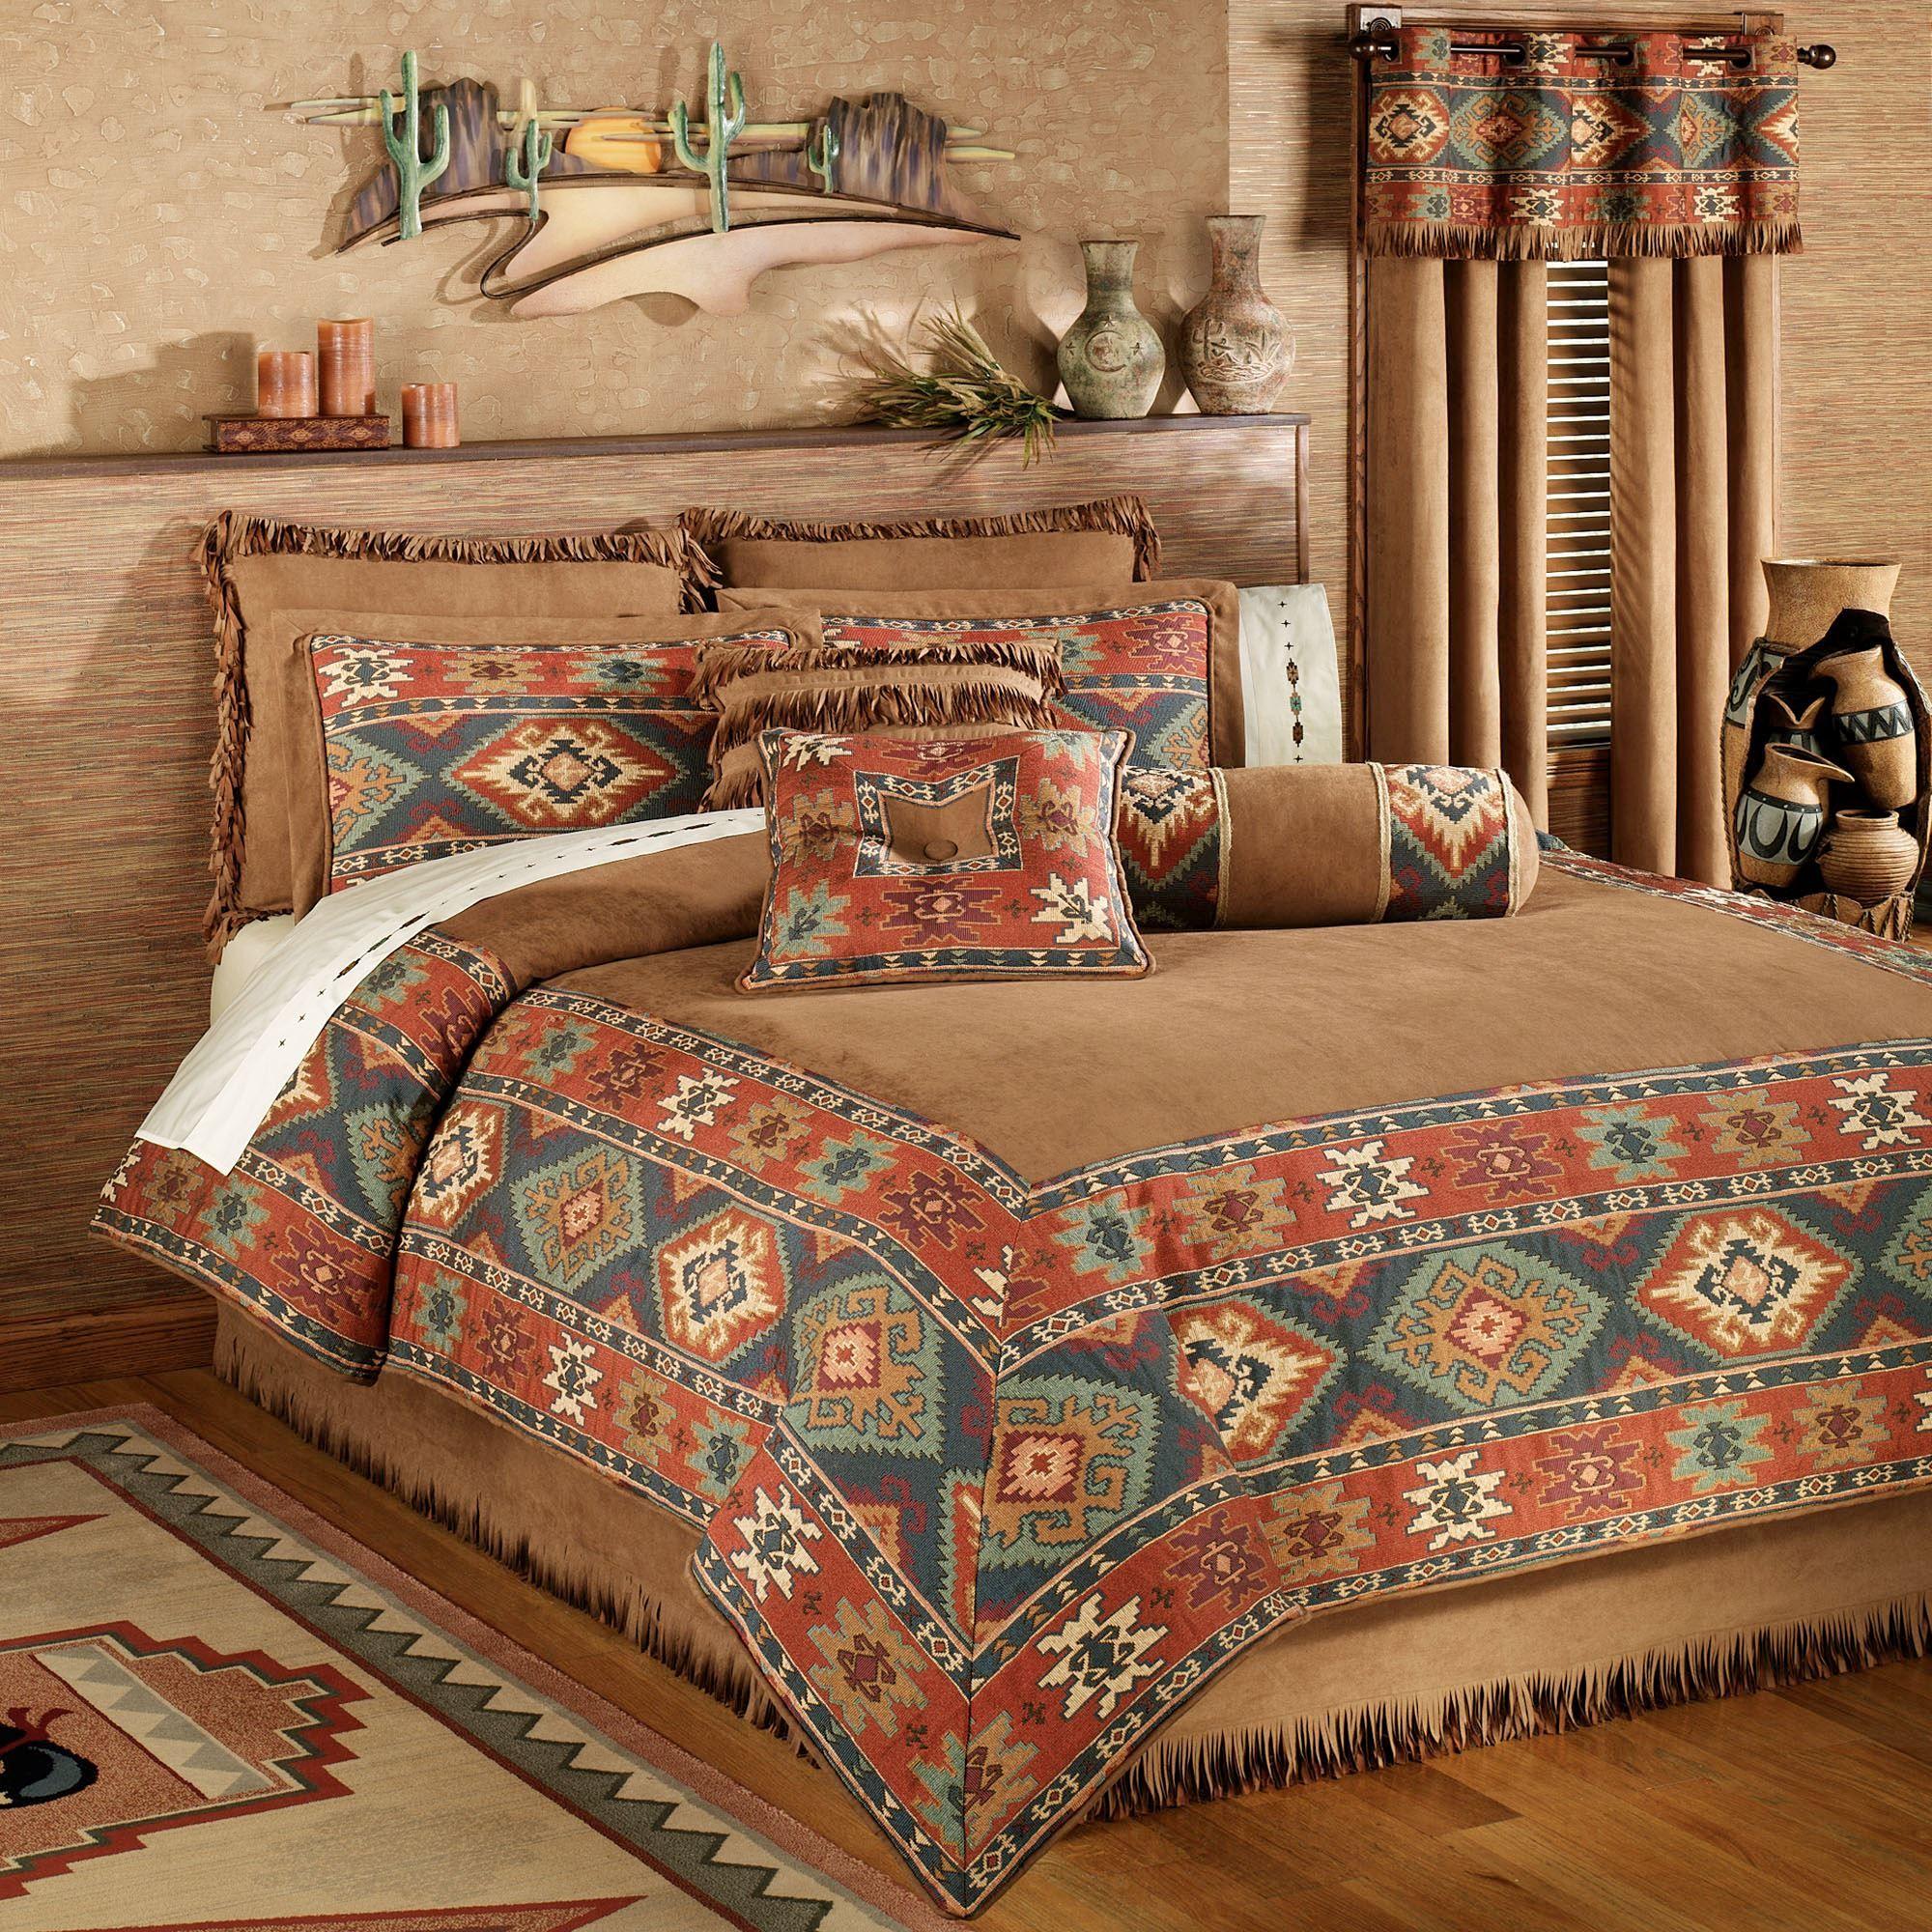 Pin By Kathy C King On Aaaa Southwest Bedroom Southwest Bedding Rustic Comforter